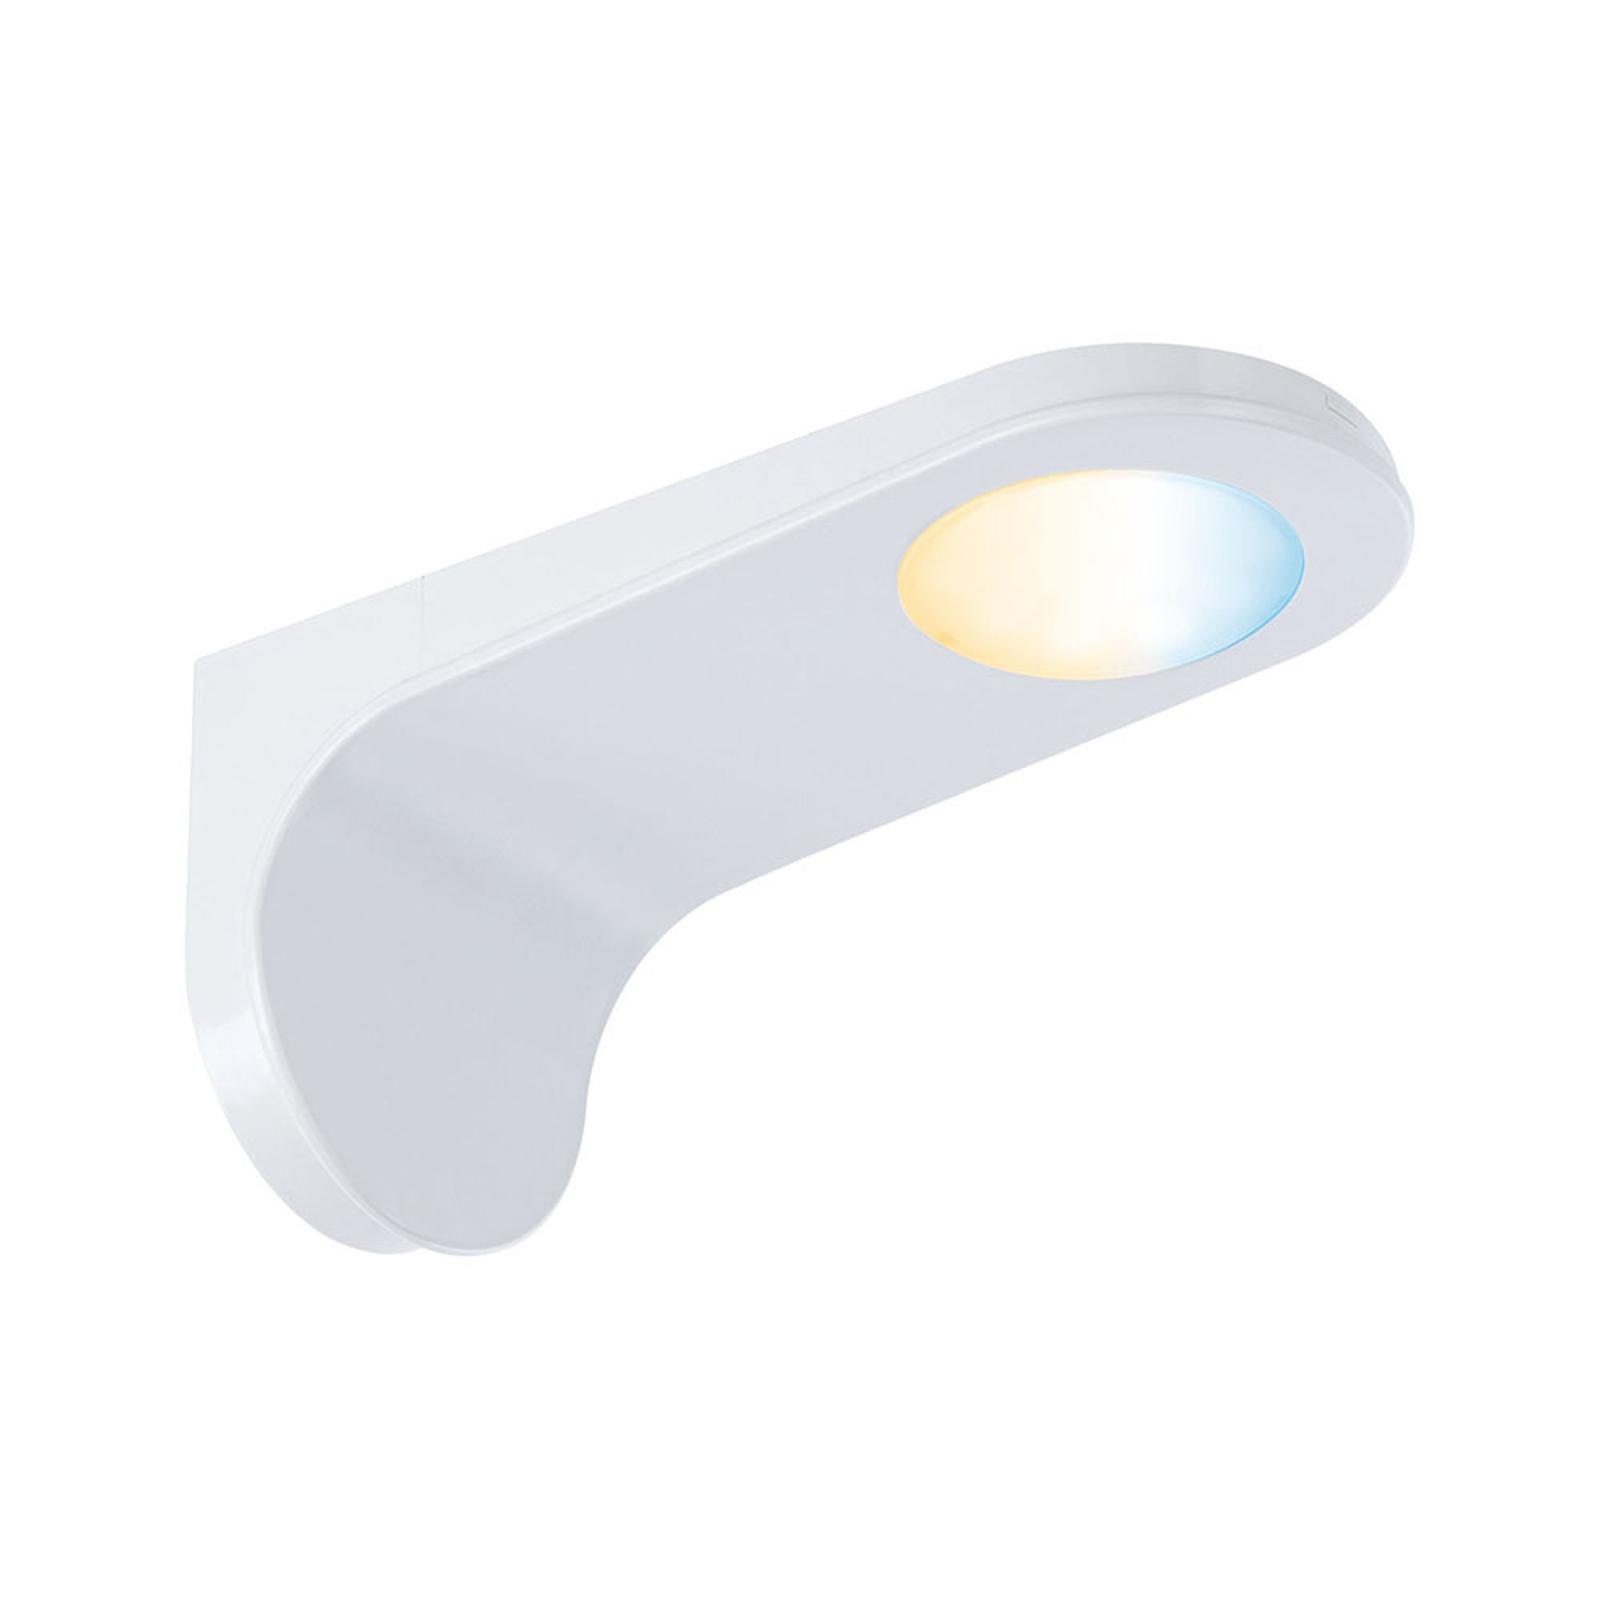 Paulmann Clever Connect Neda lampa do mebli, biała